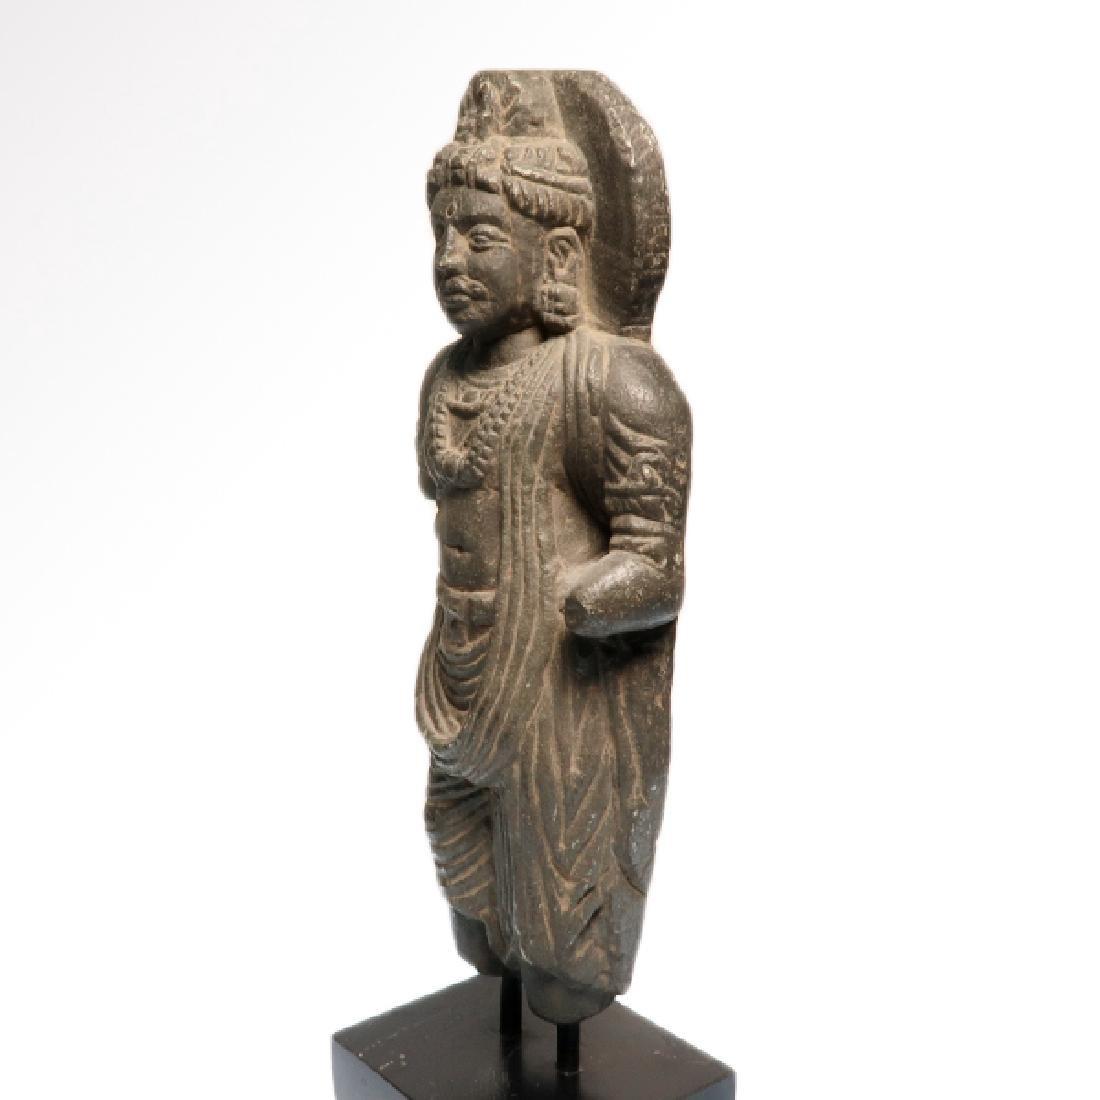 Gandhara Schist Figure of a Standing Buddha, c. 2nd-3rd - 5